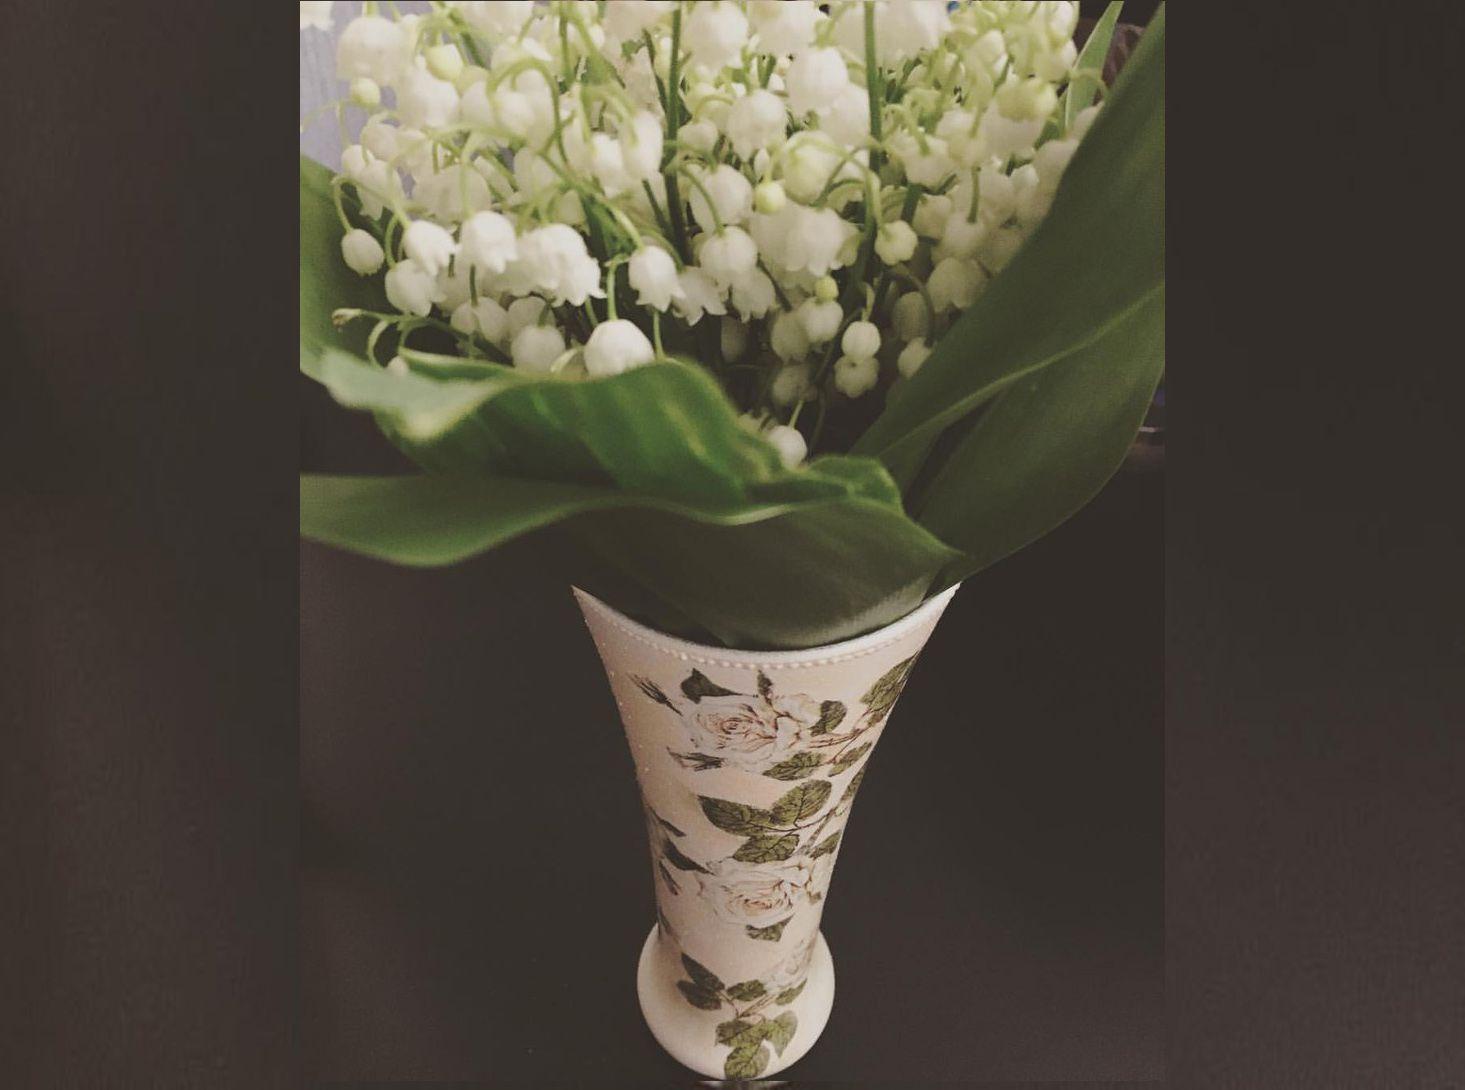 декоративнаятарелка точечнаяроспись handmade ваза декор розы ручнаяработа подарок